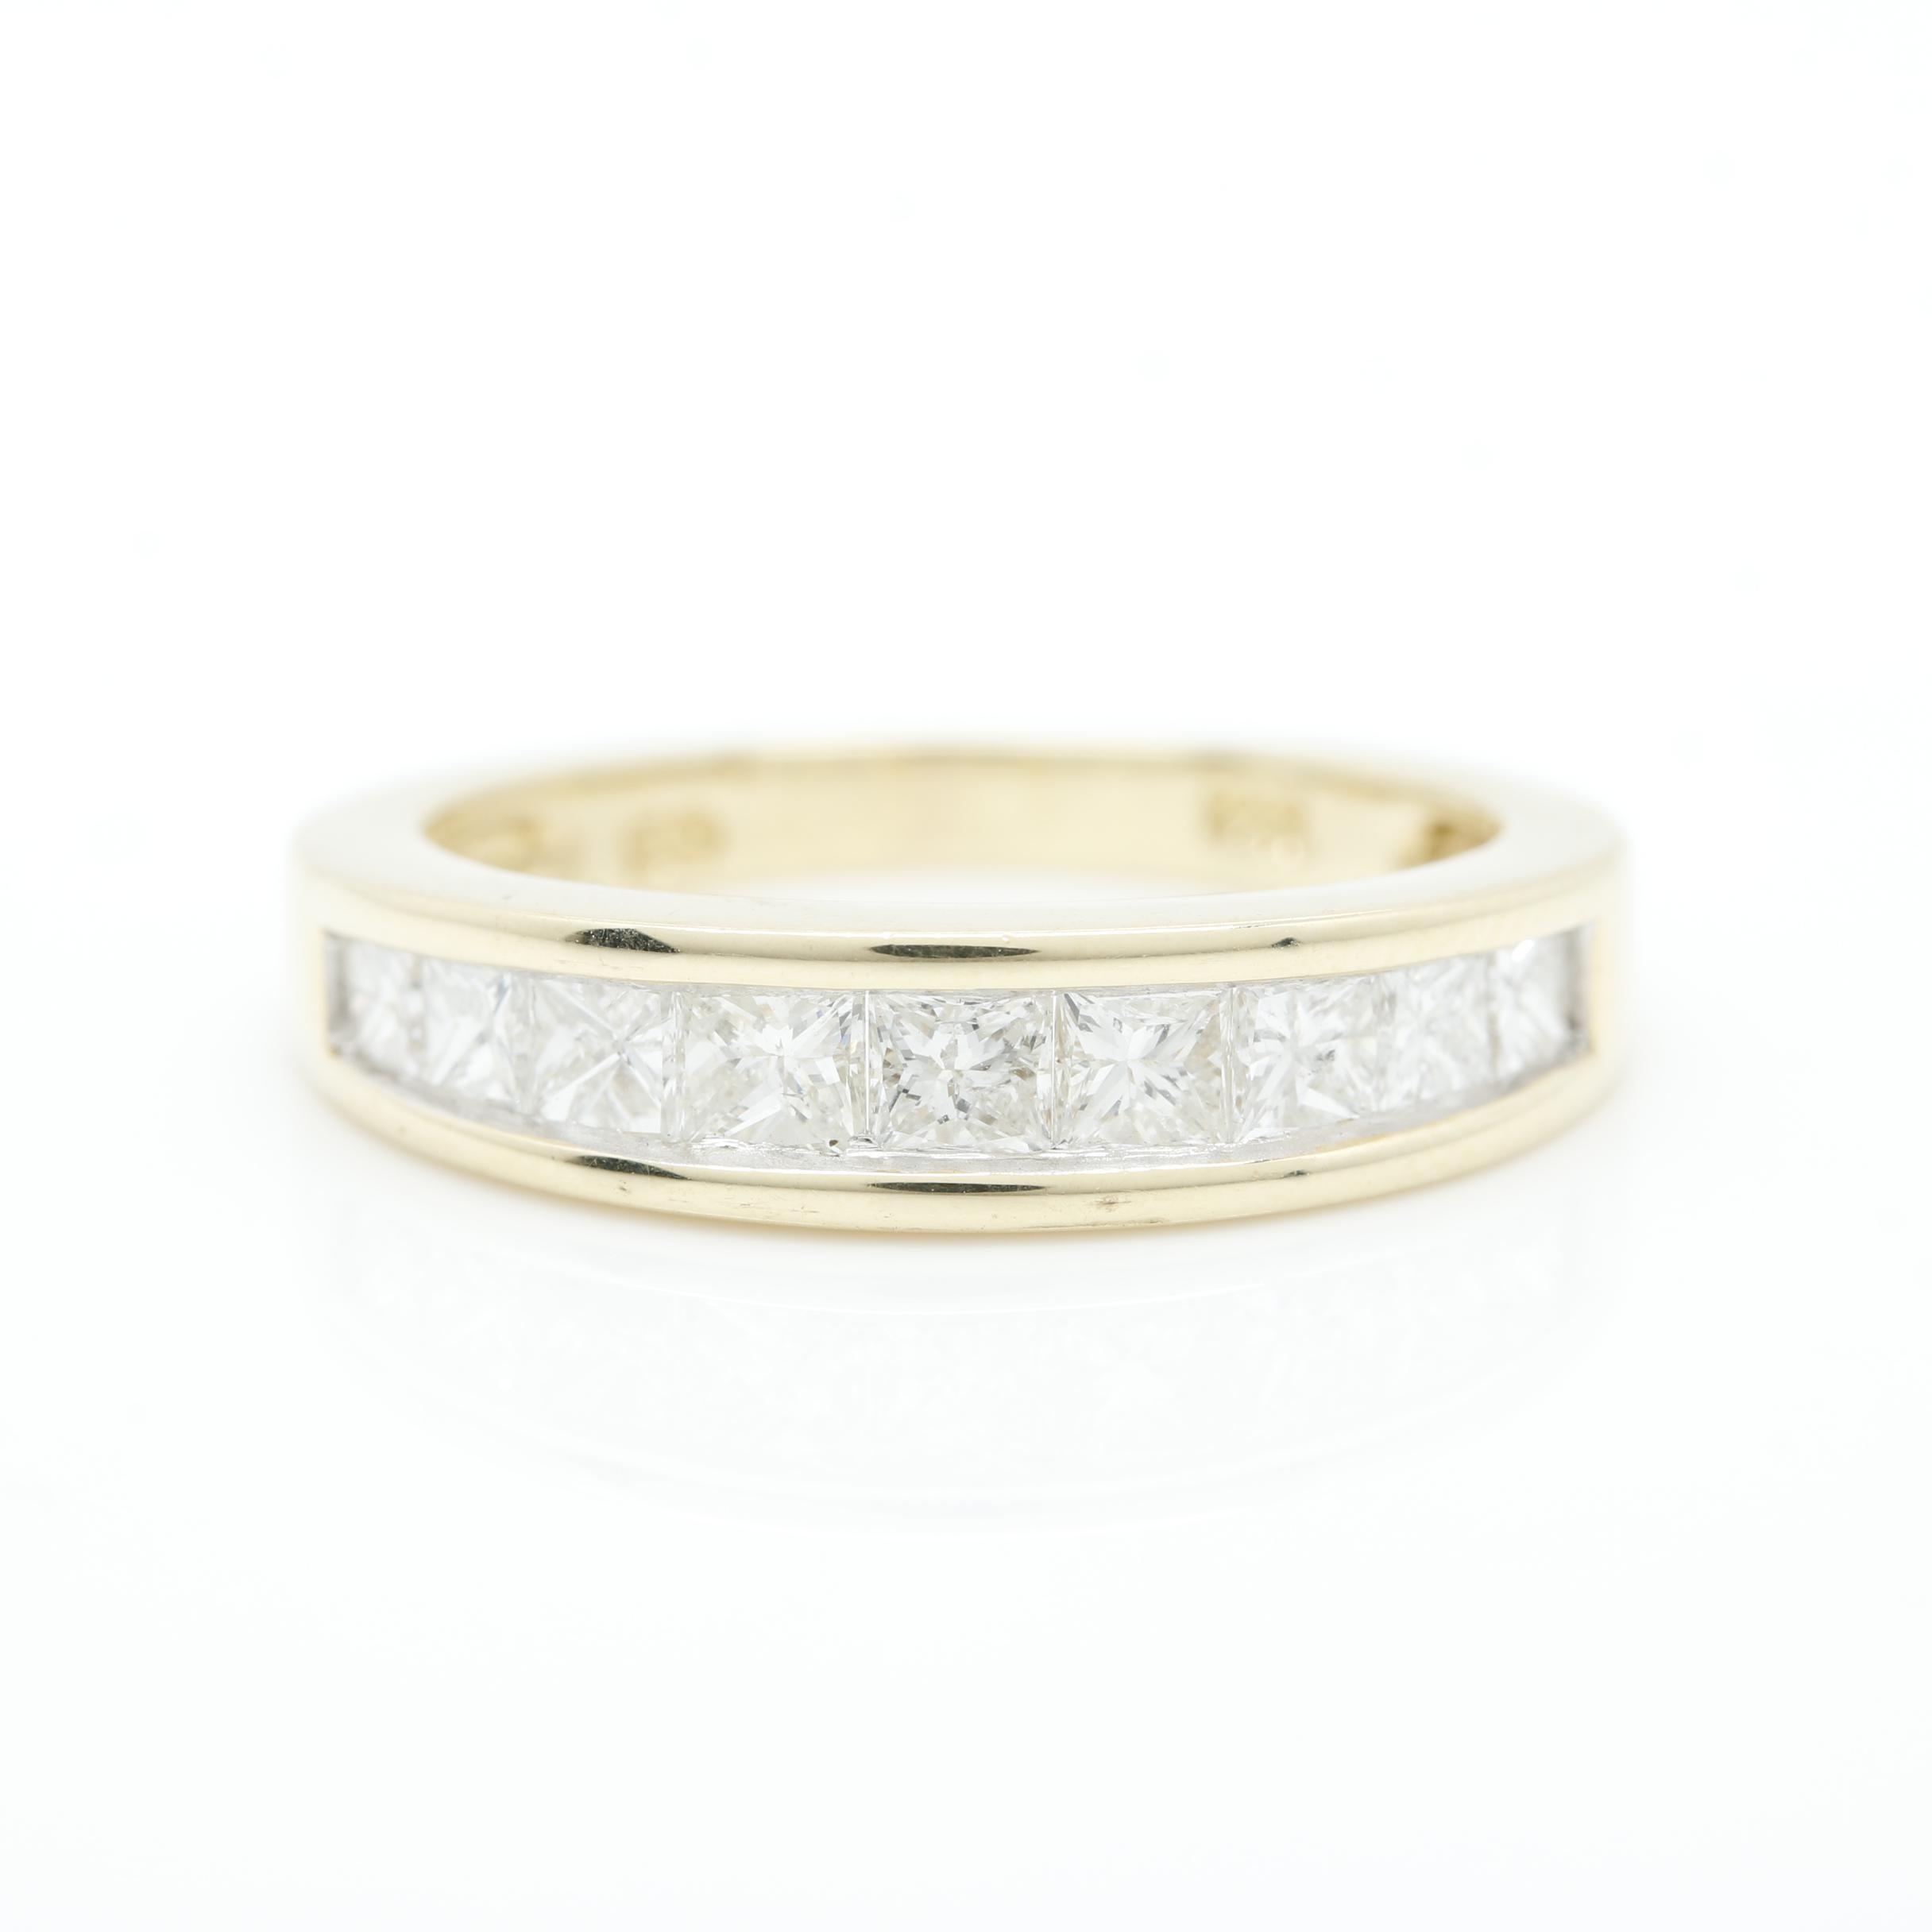 14K Yellow Gold 1.05 CTW Diamond Ring